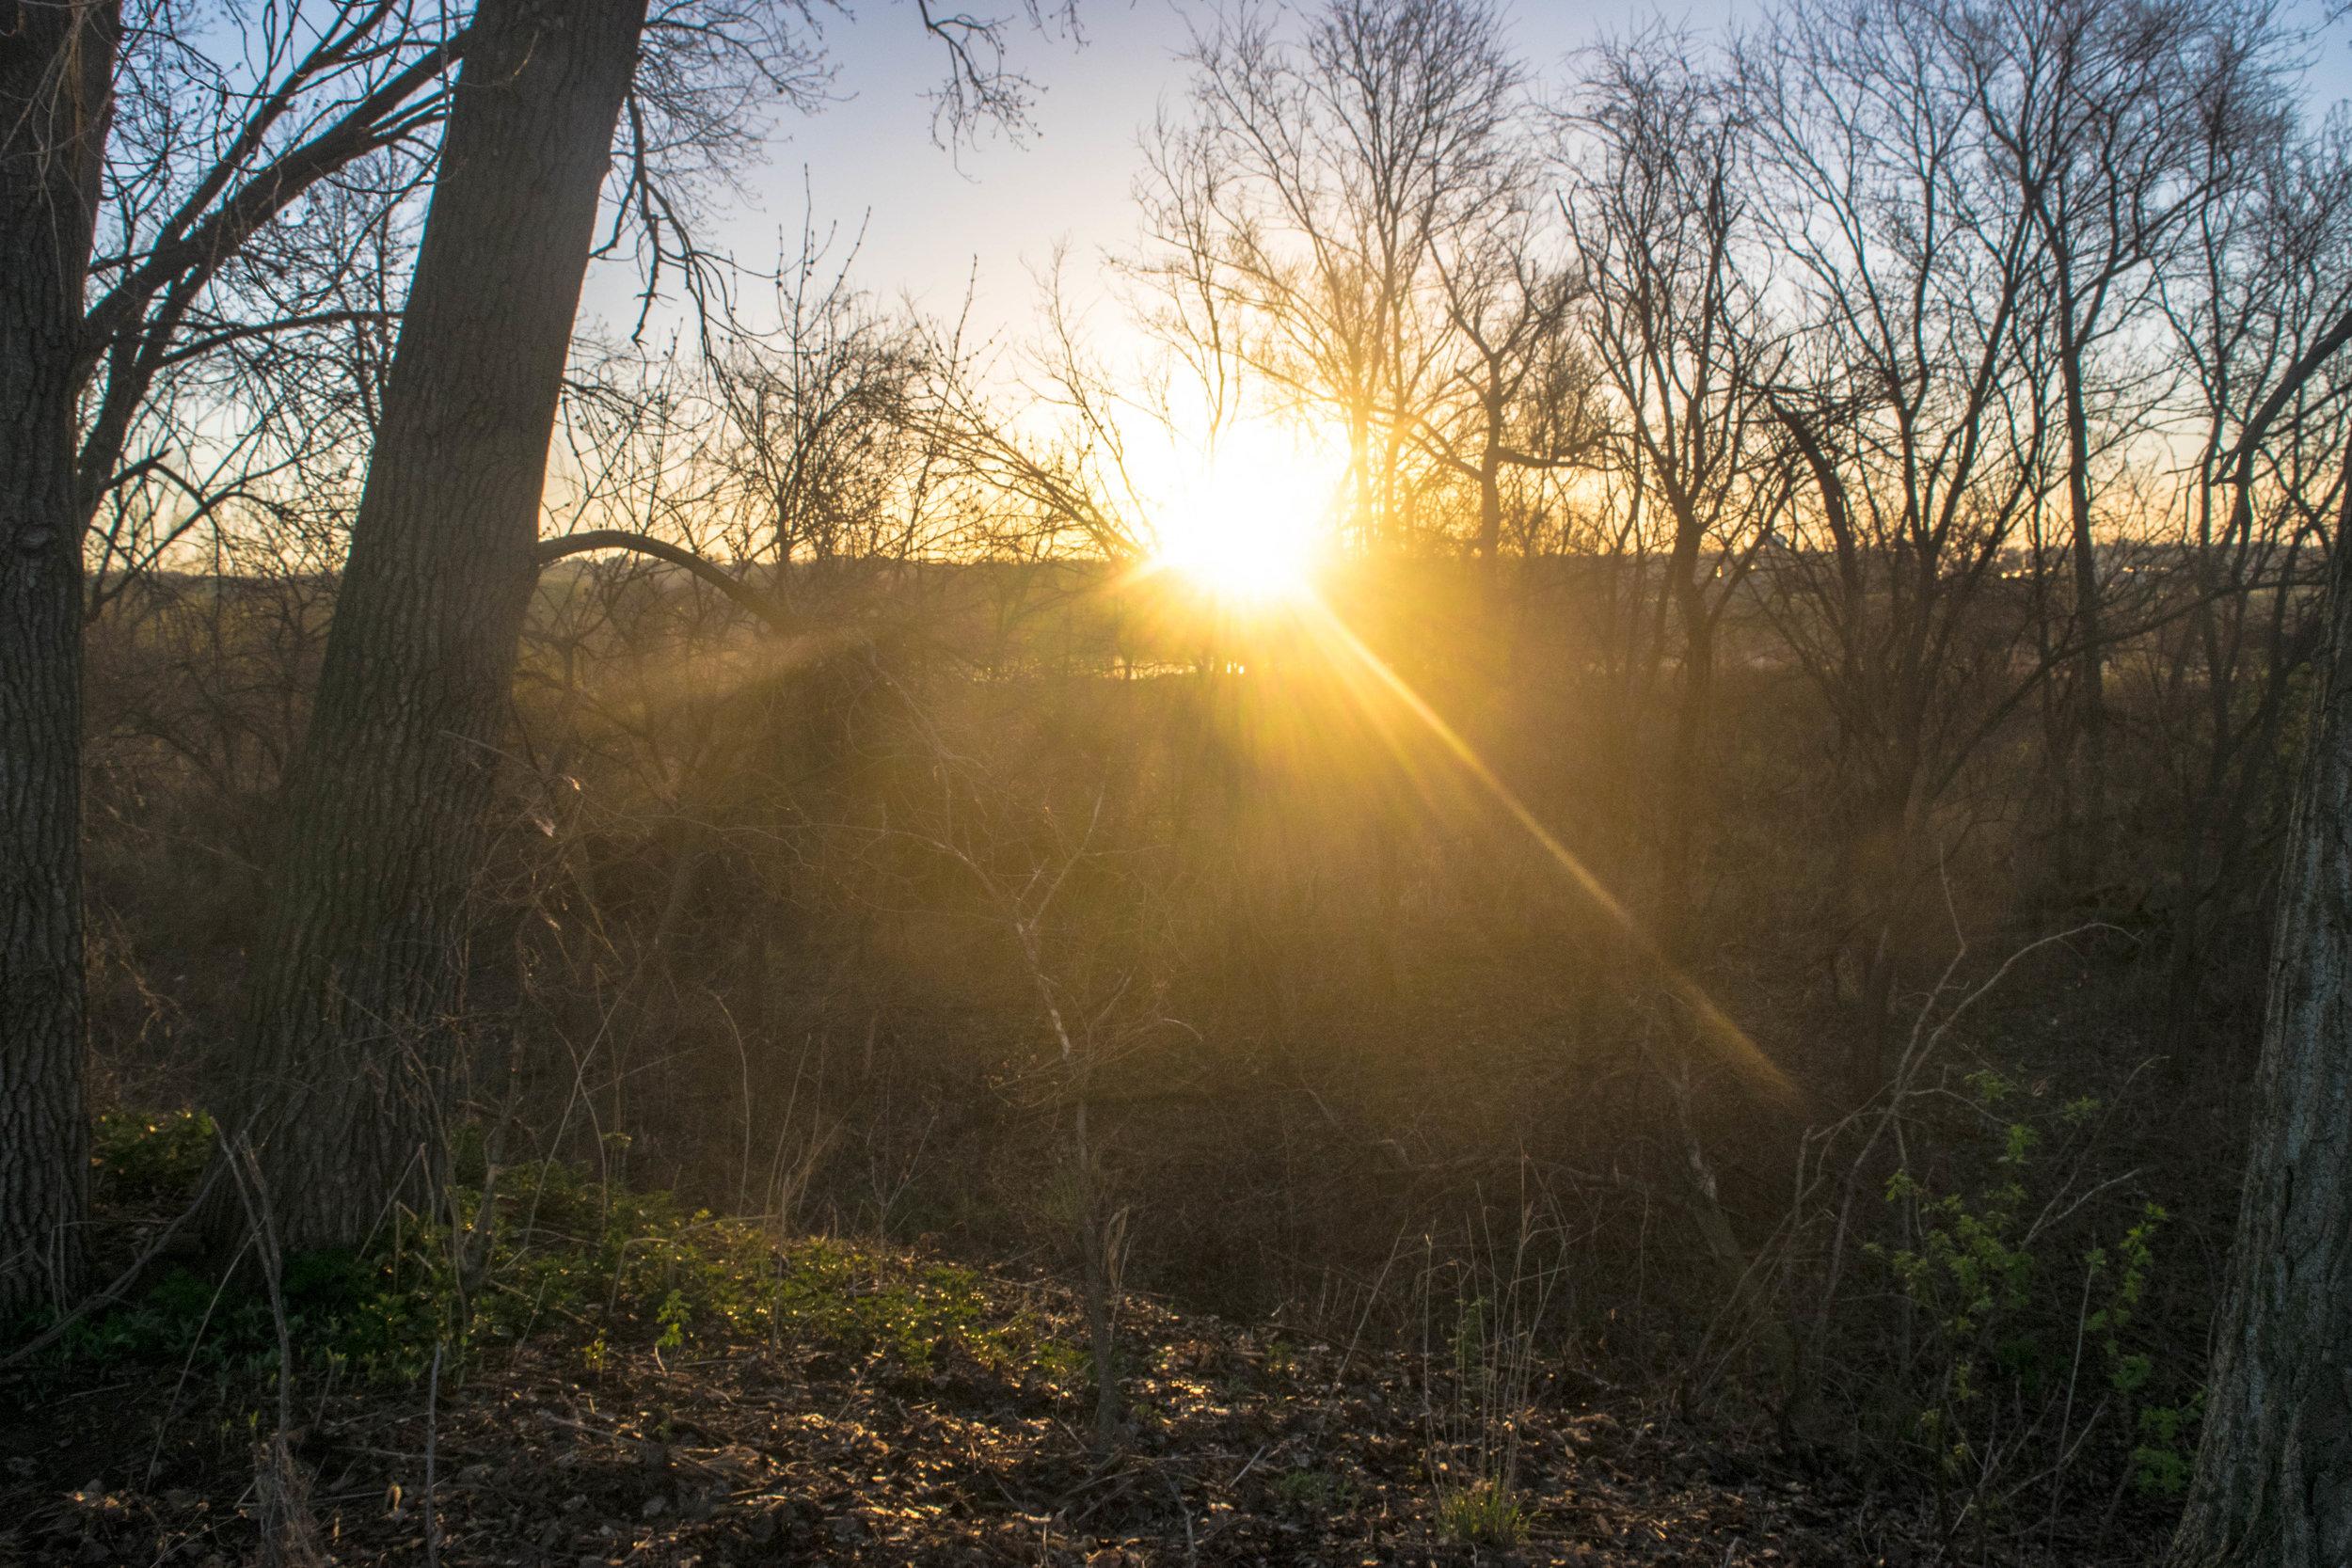 Sunrise on my first morning hunting turkeys